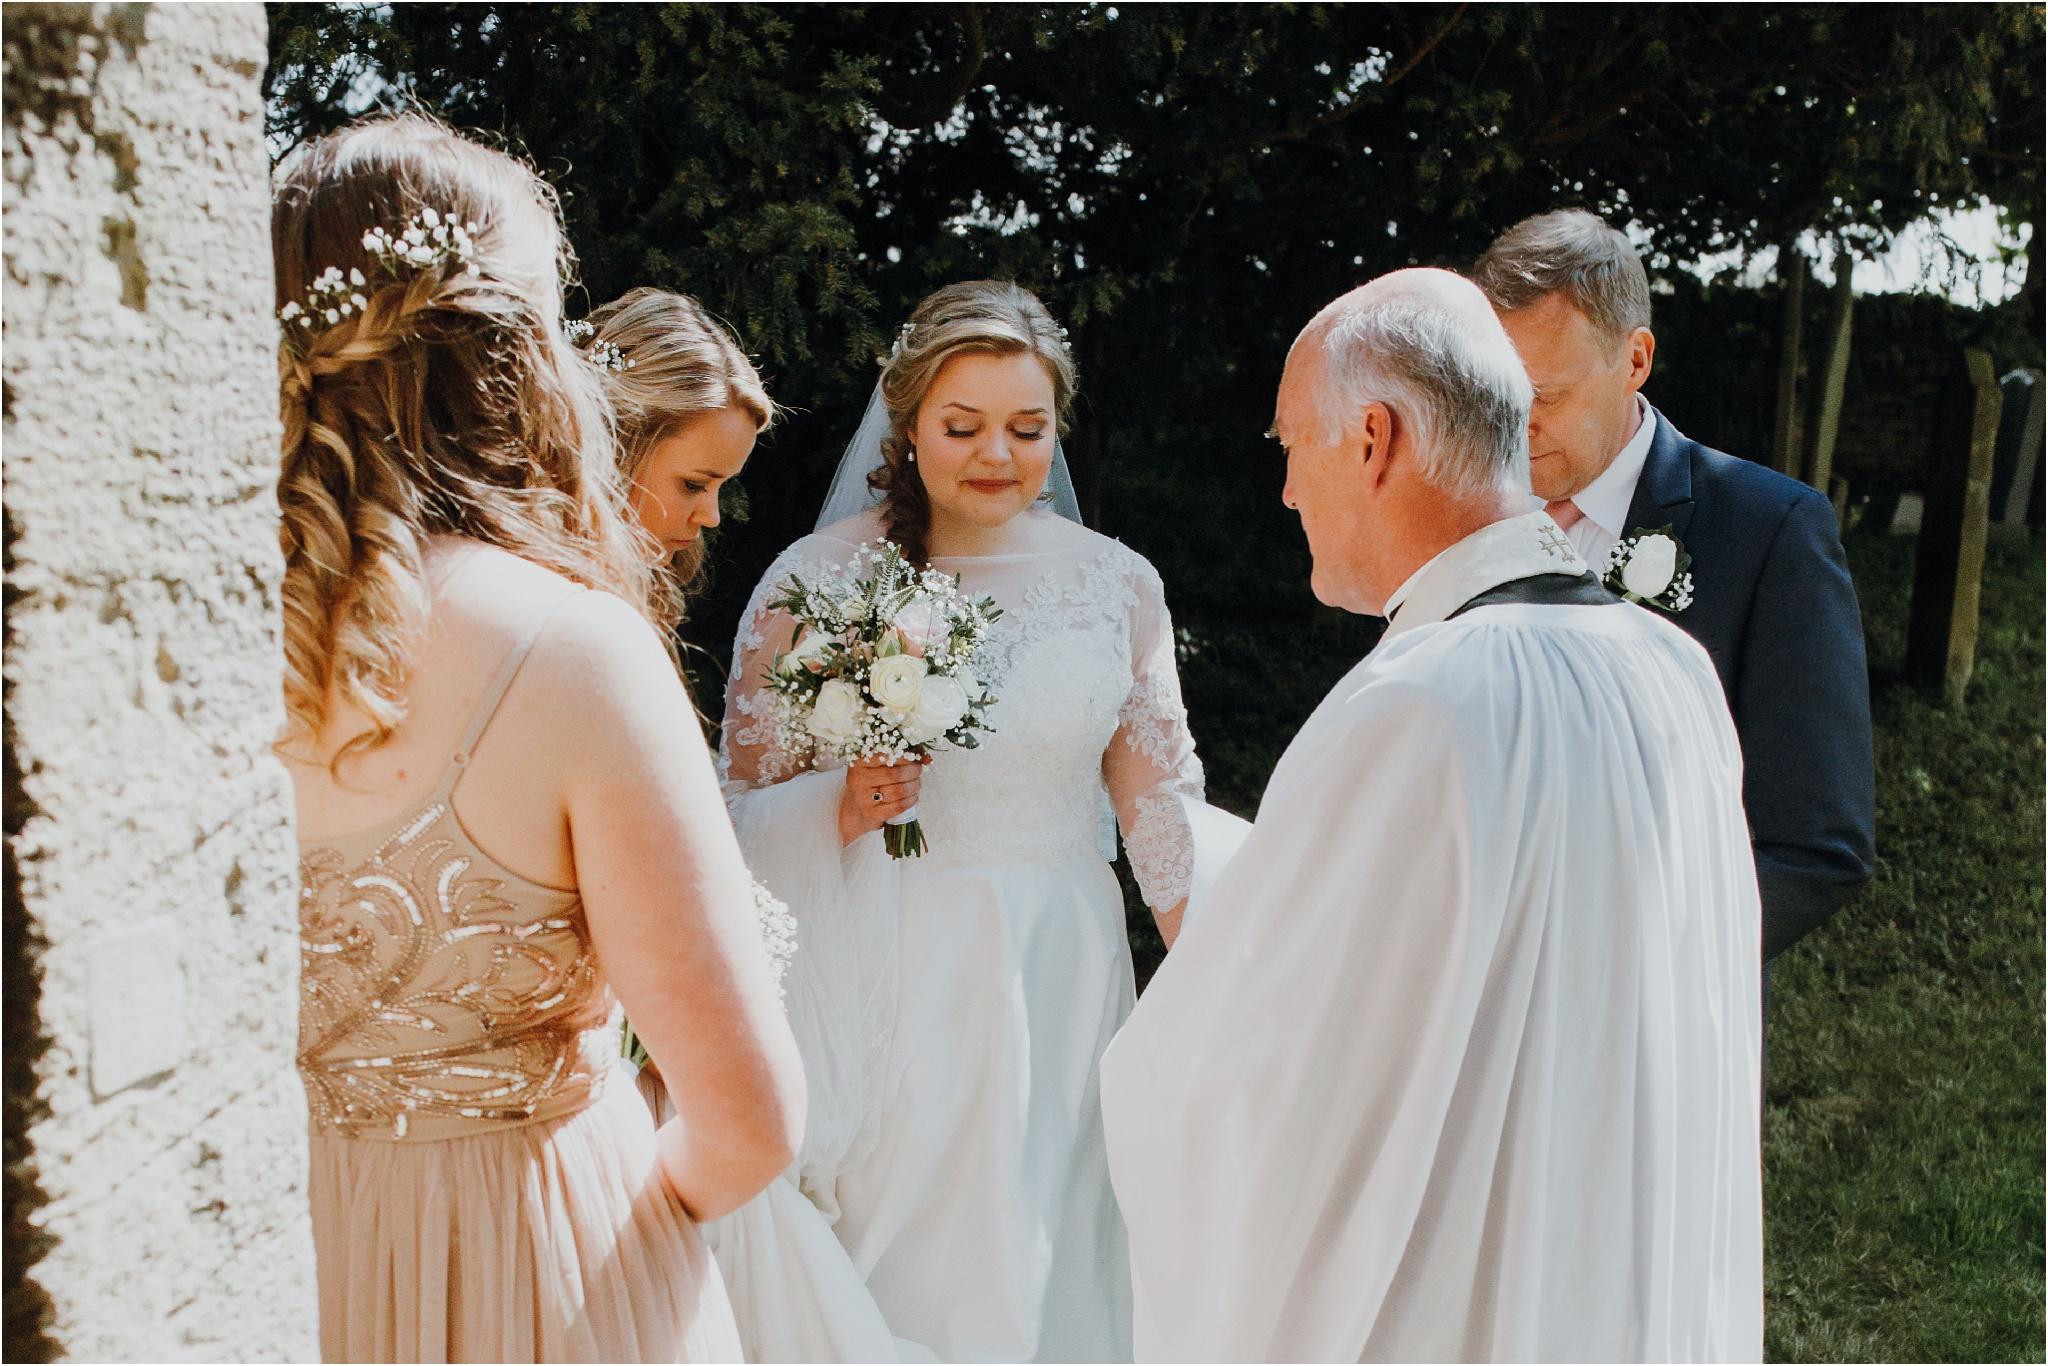 Outdoor-country-wedding-Edinburgh-photographer__0062.jpg